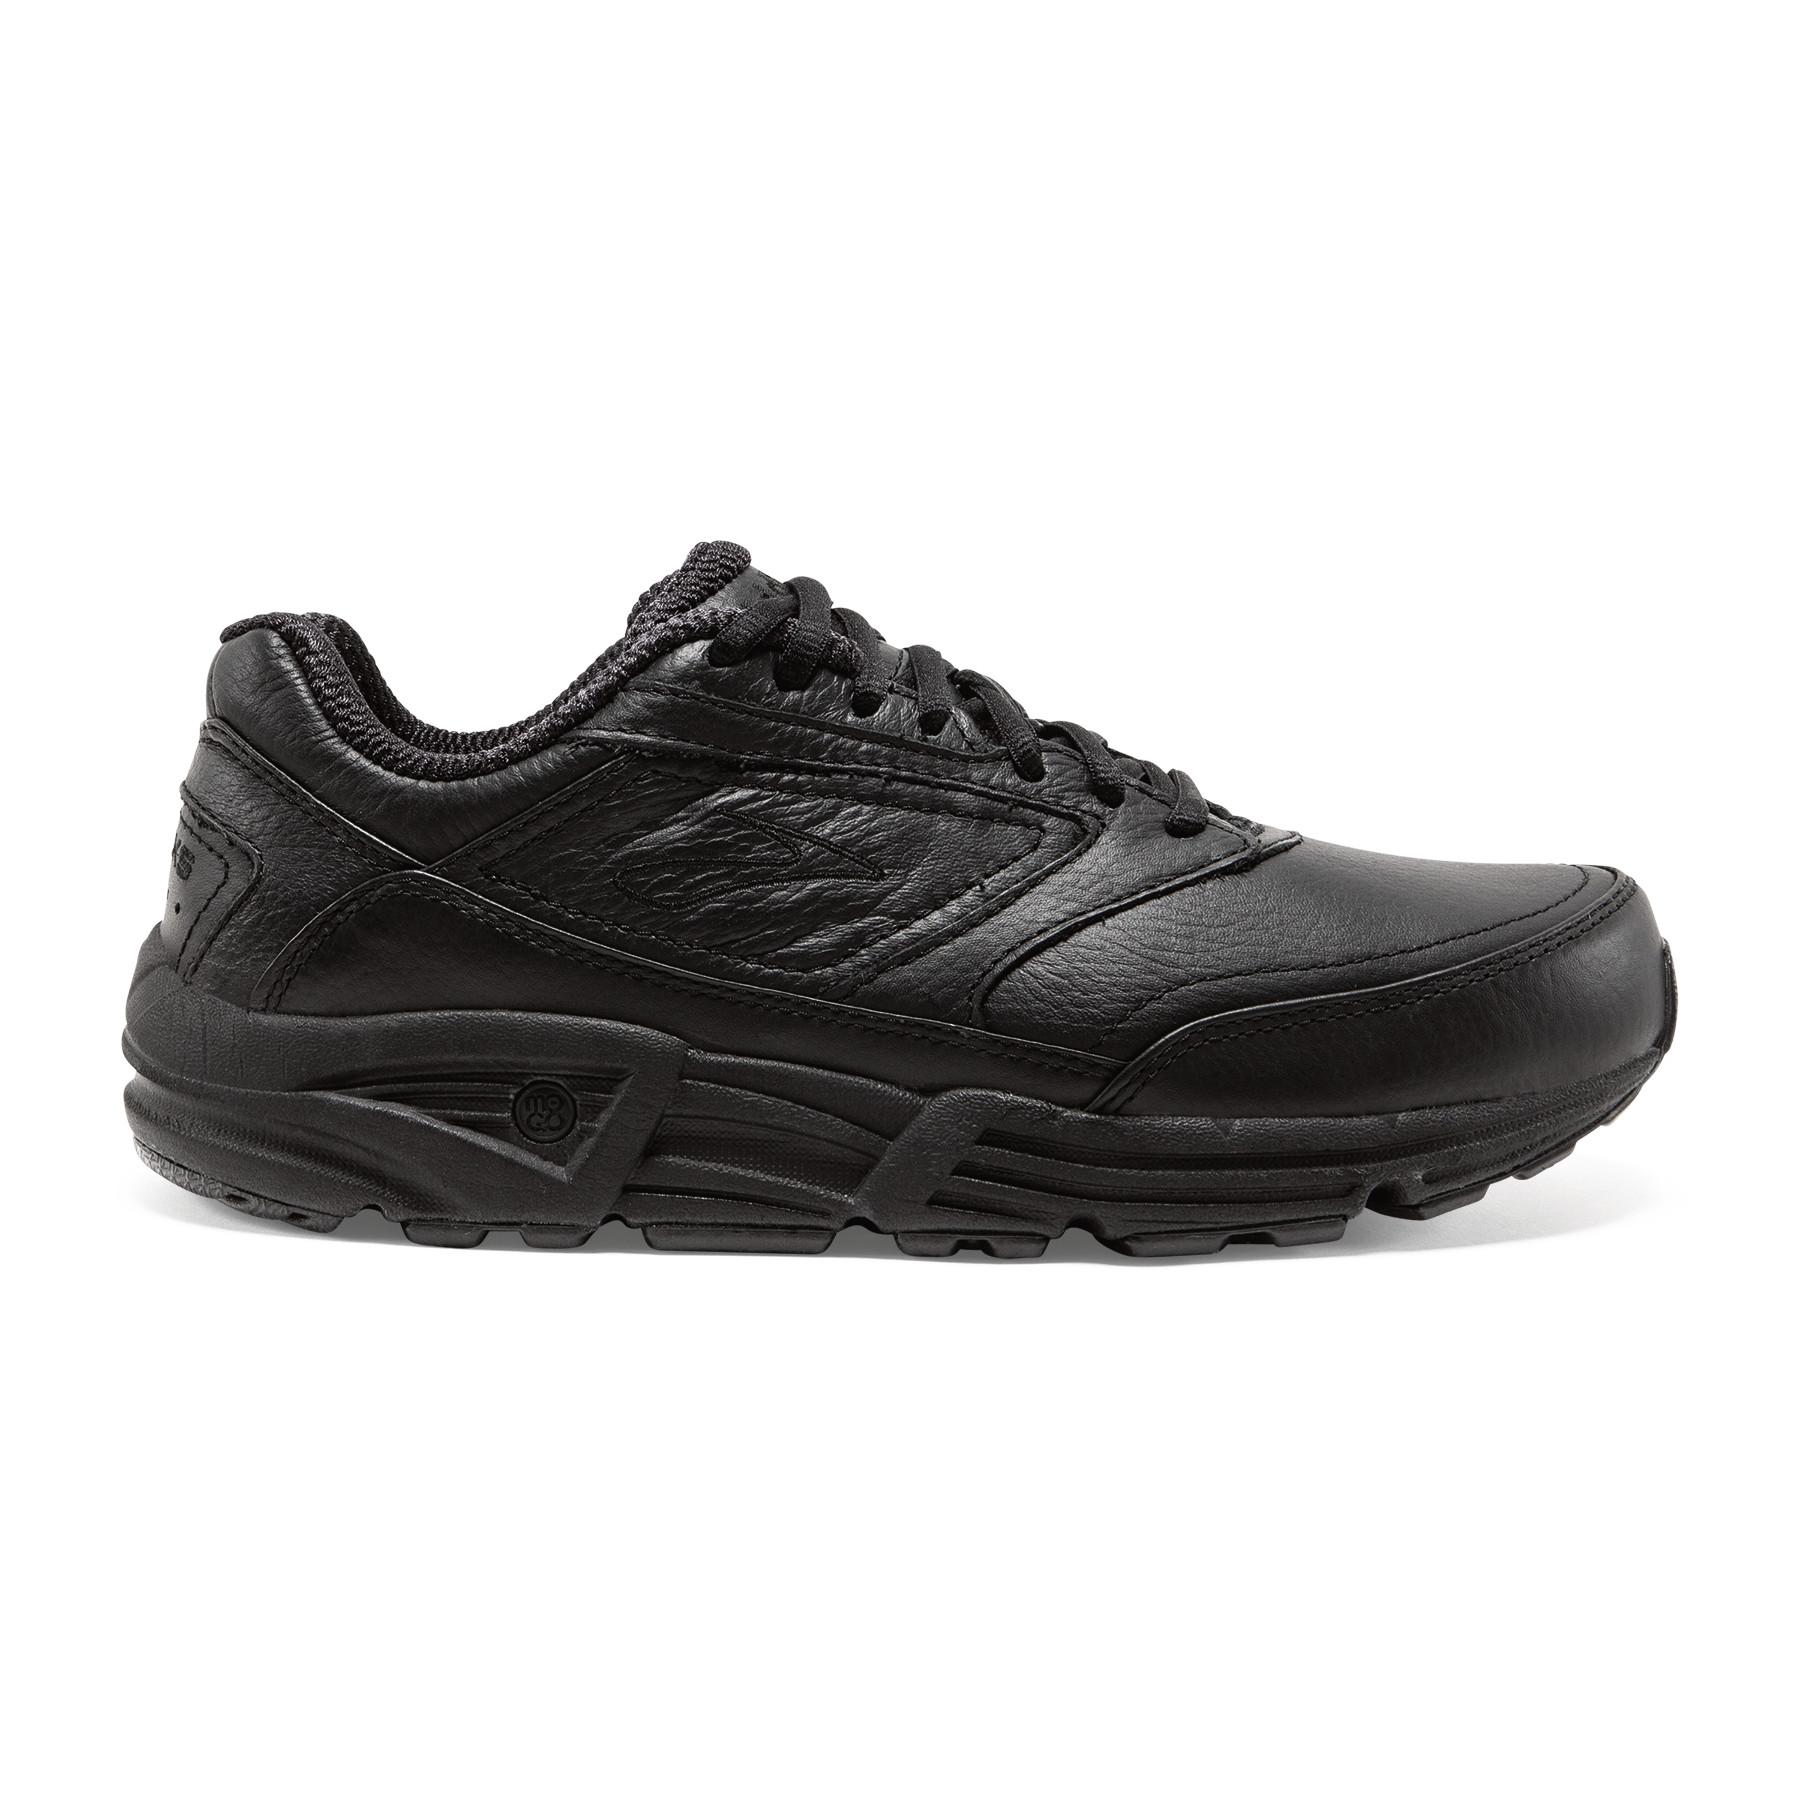 40c6cbf28f8 Home   Shoes   Road   Brooks Men s Addiction Walker Extra Wide Fit (4E).  Sale! 120032 001 L Addiction Walker 300 CMYK